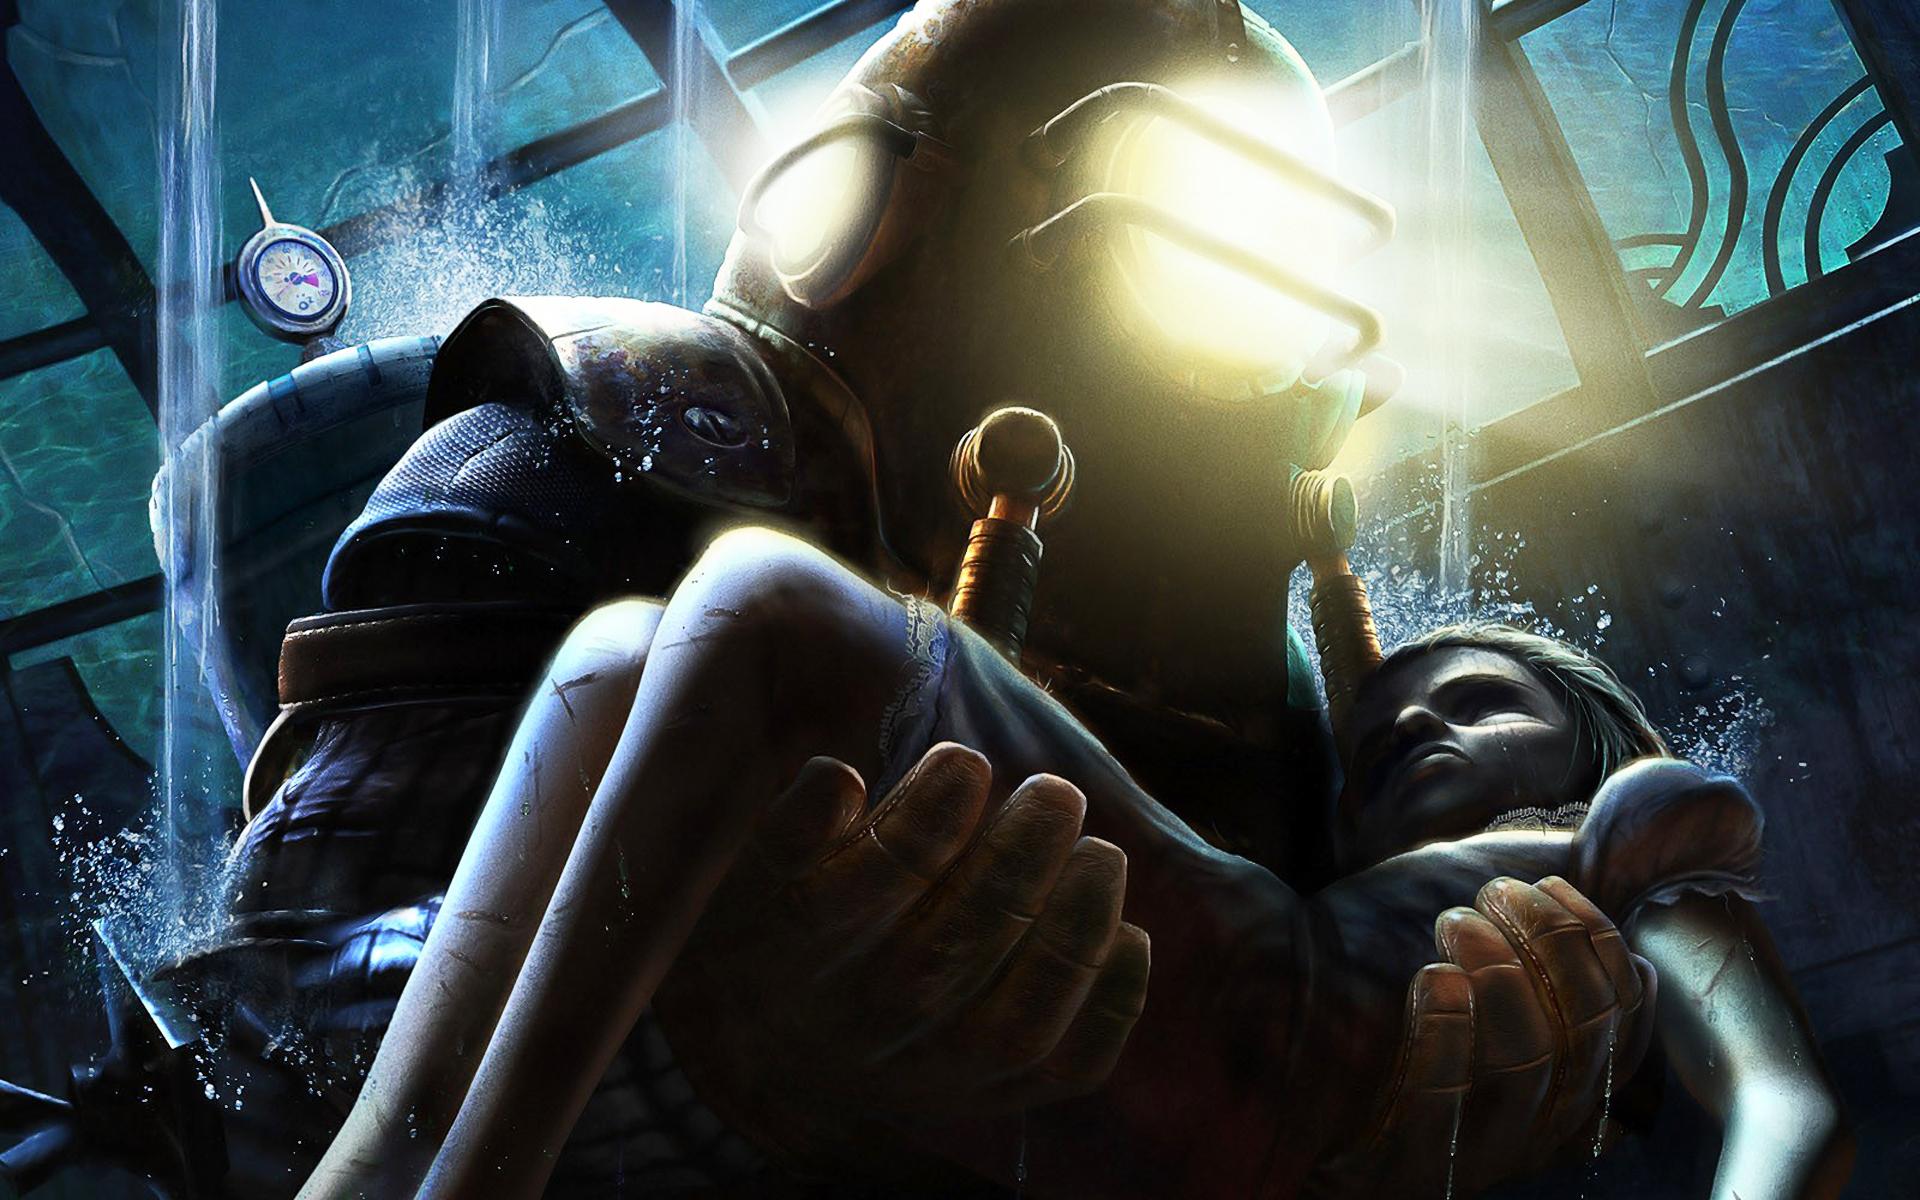 Games_Bioshock_022740_.jpg - -